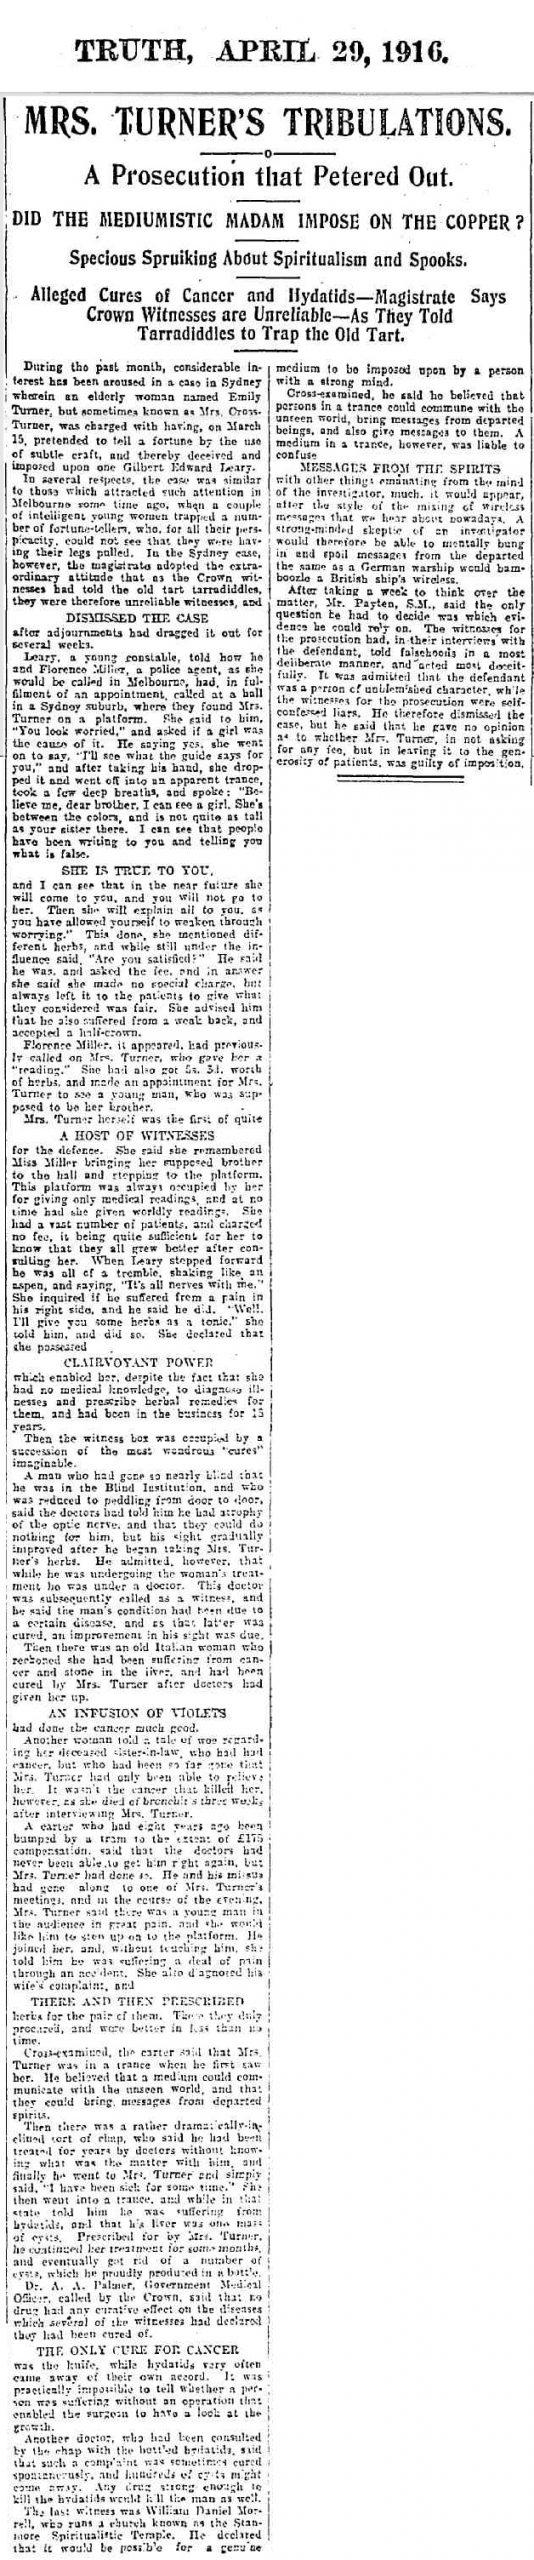 1916 04 29 - Mrs Turner's Tribulations copy